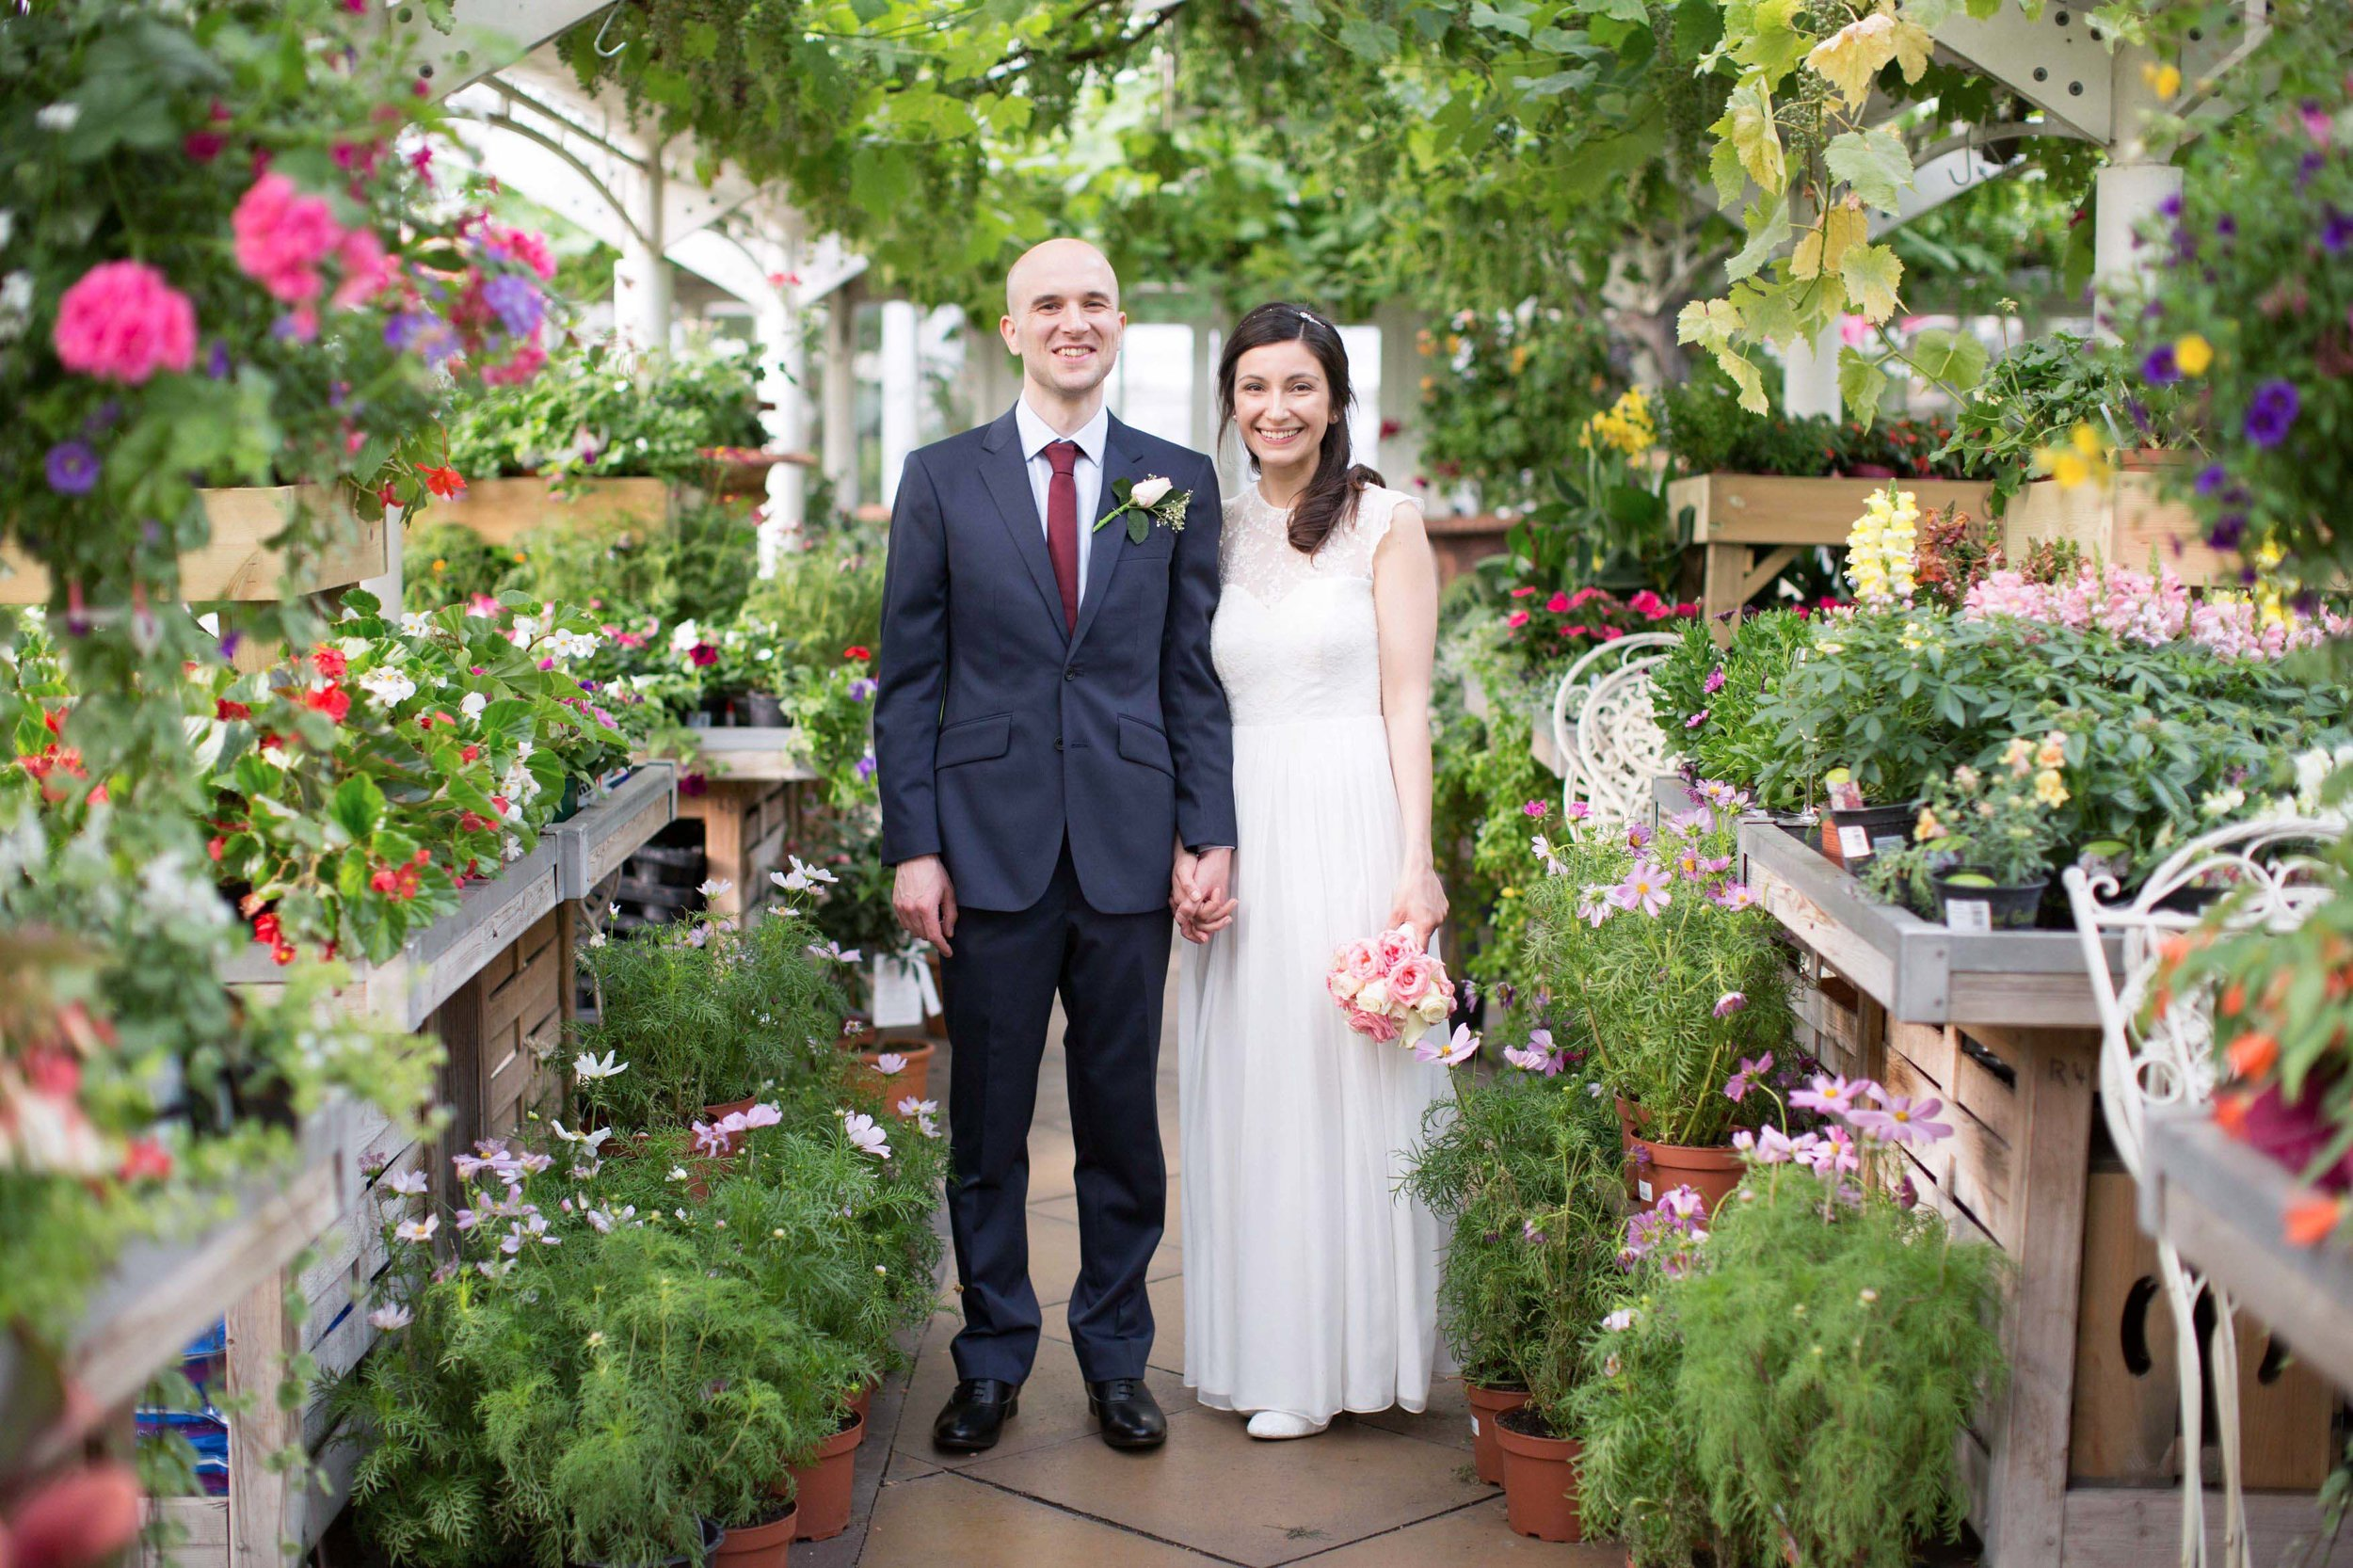 Hulya_&_Ben's_Clifton_Nurseries_London_Wedding_0548.jpg